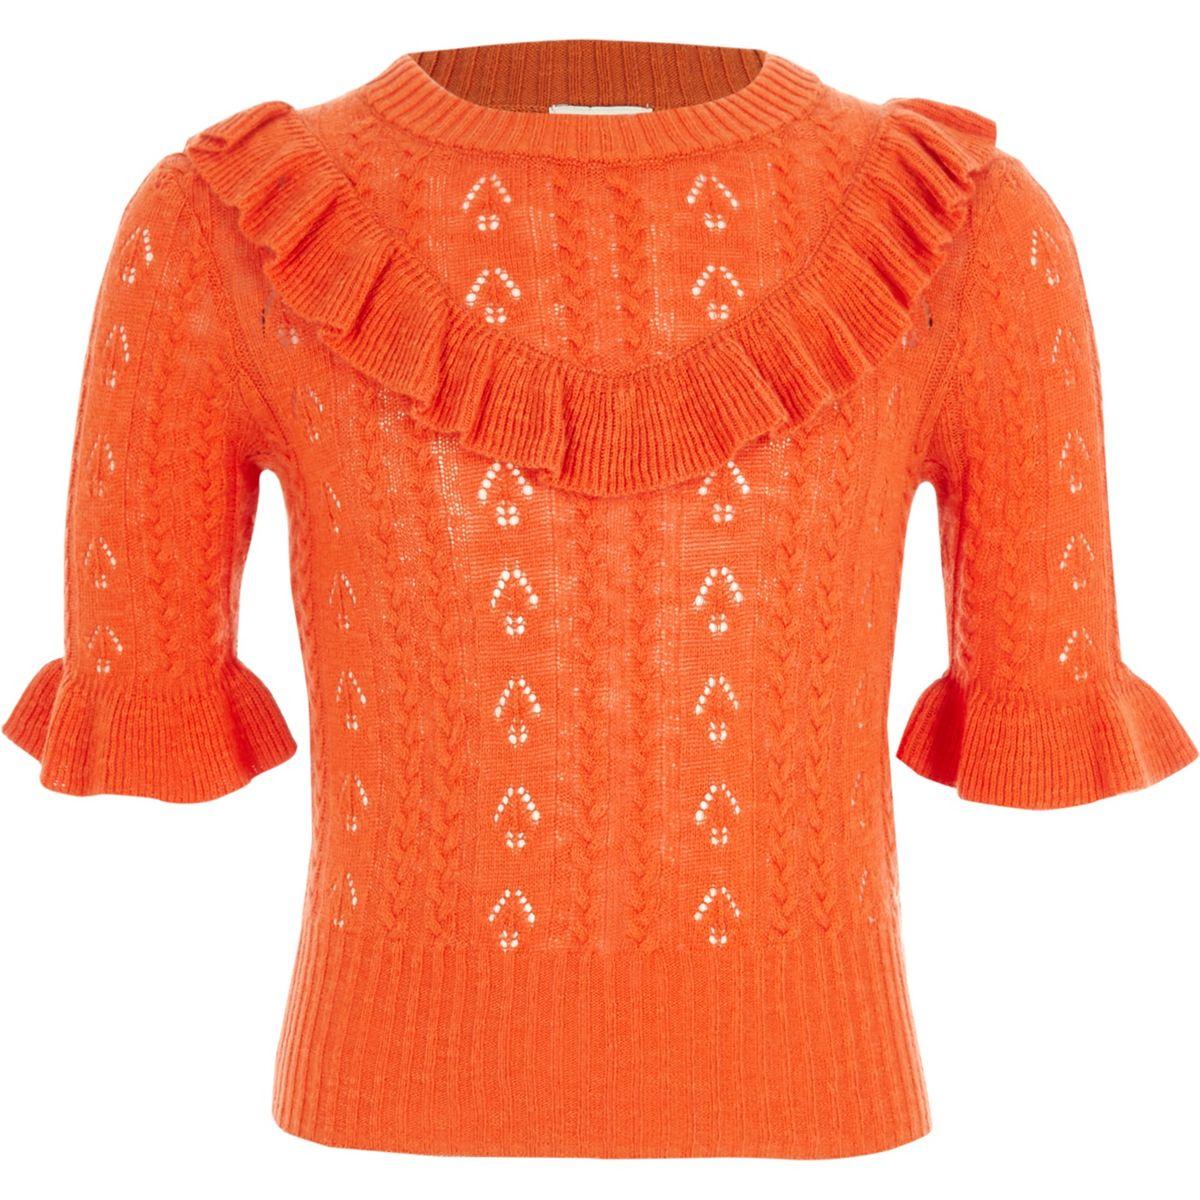 Girls orange frill pointelle knit sweater